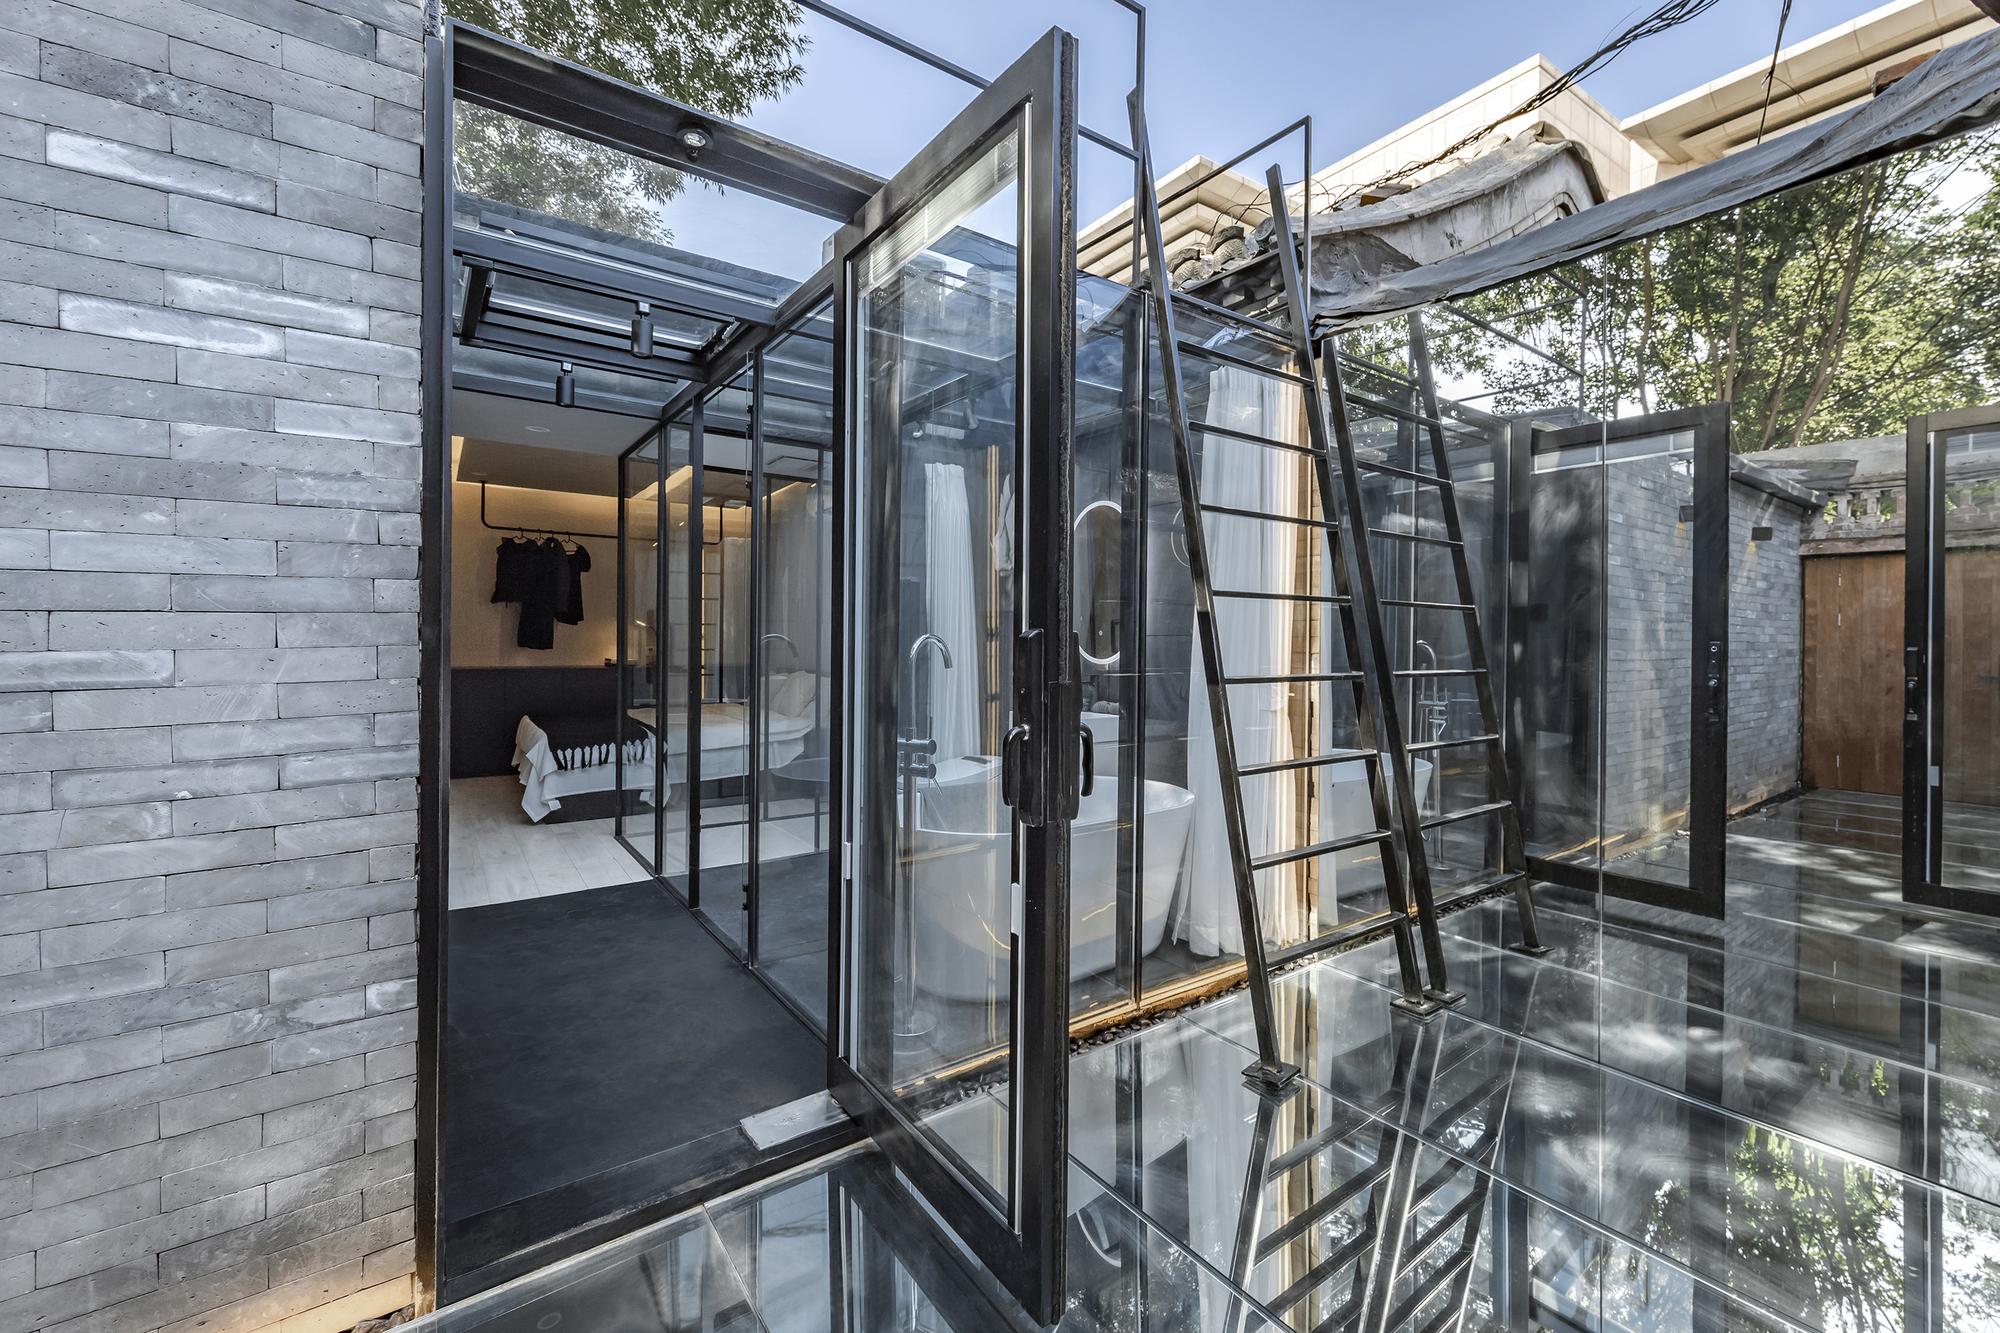 Baochao Hutong Invisible Yard / DAGA Architects